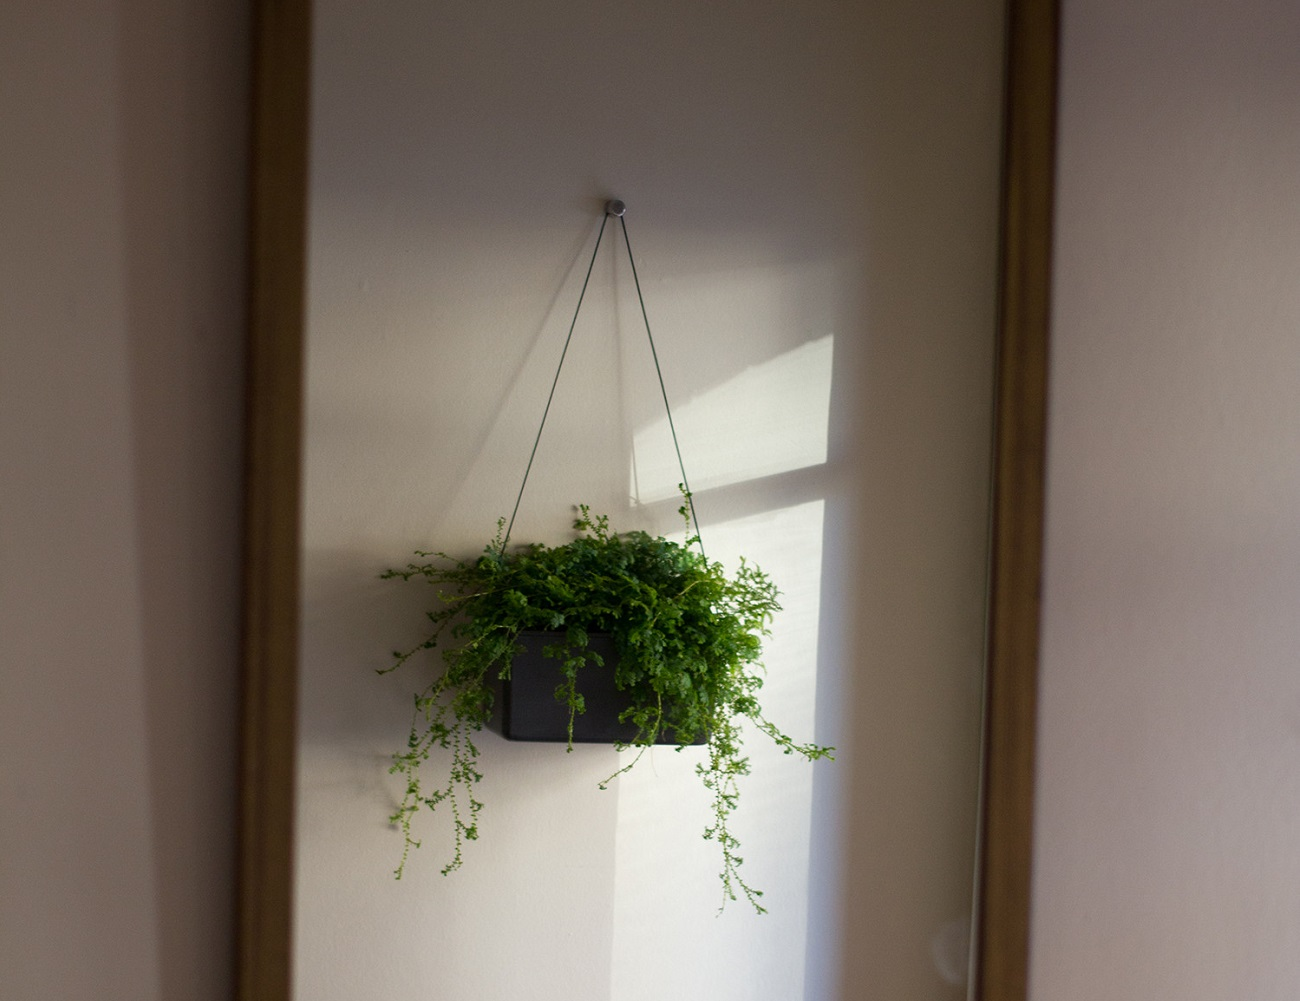 Hängen Wall Planter